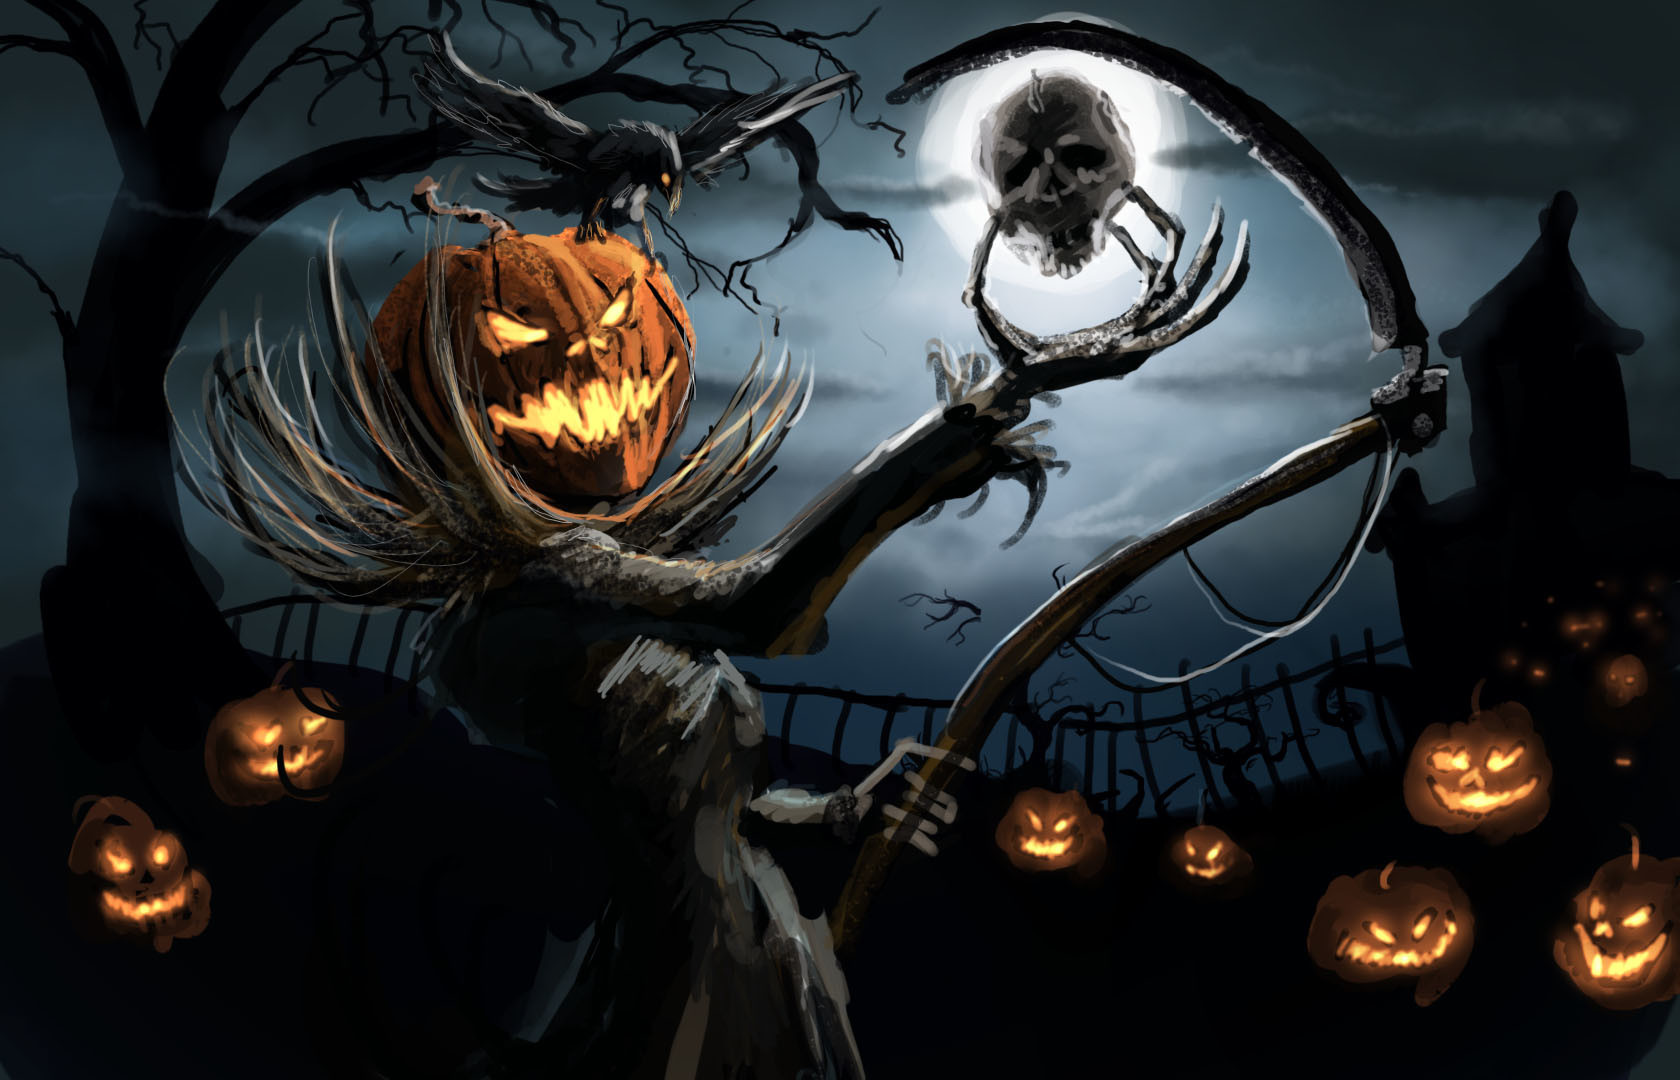 Scary Halloween Widescreen